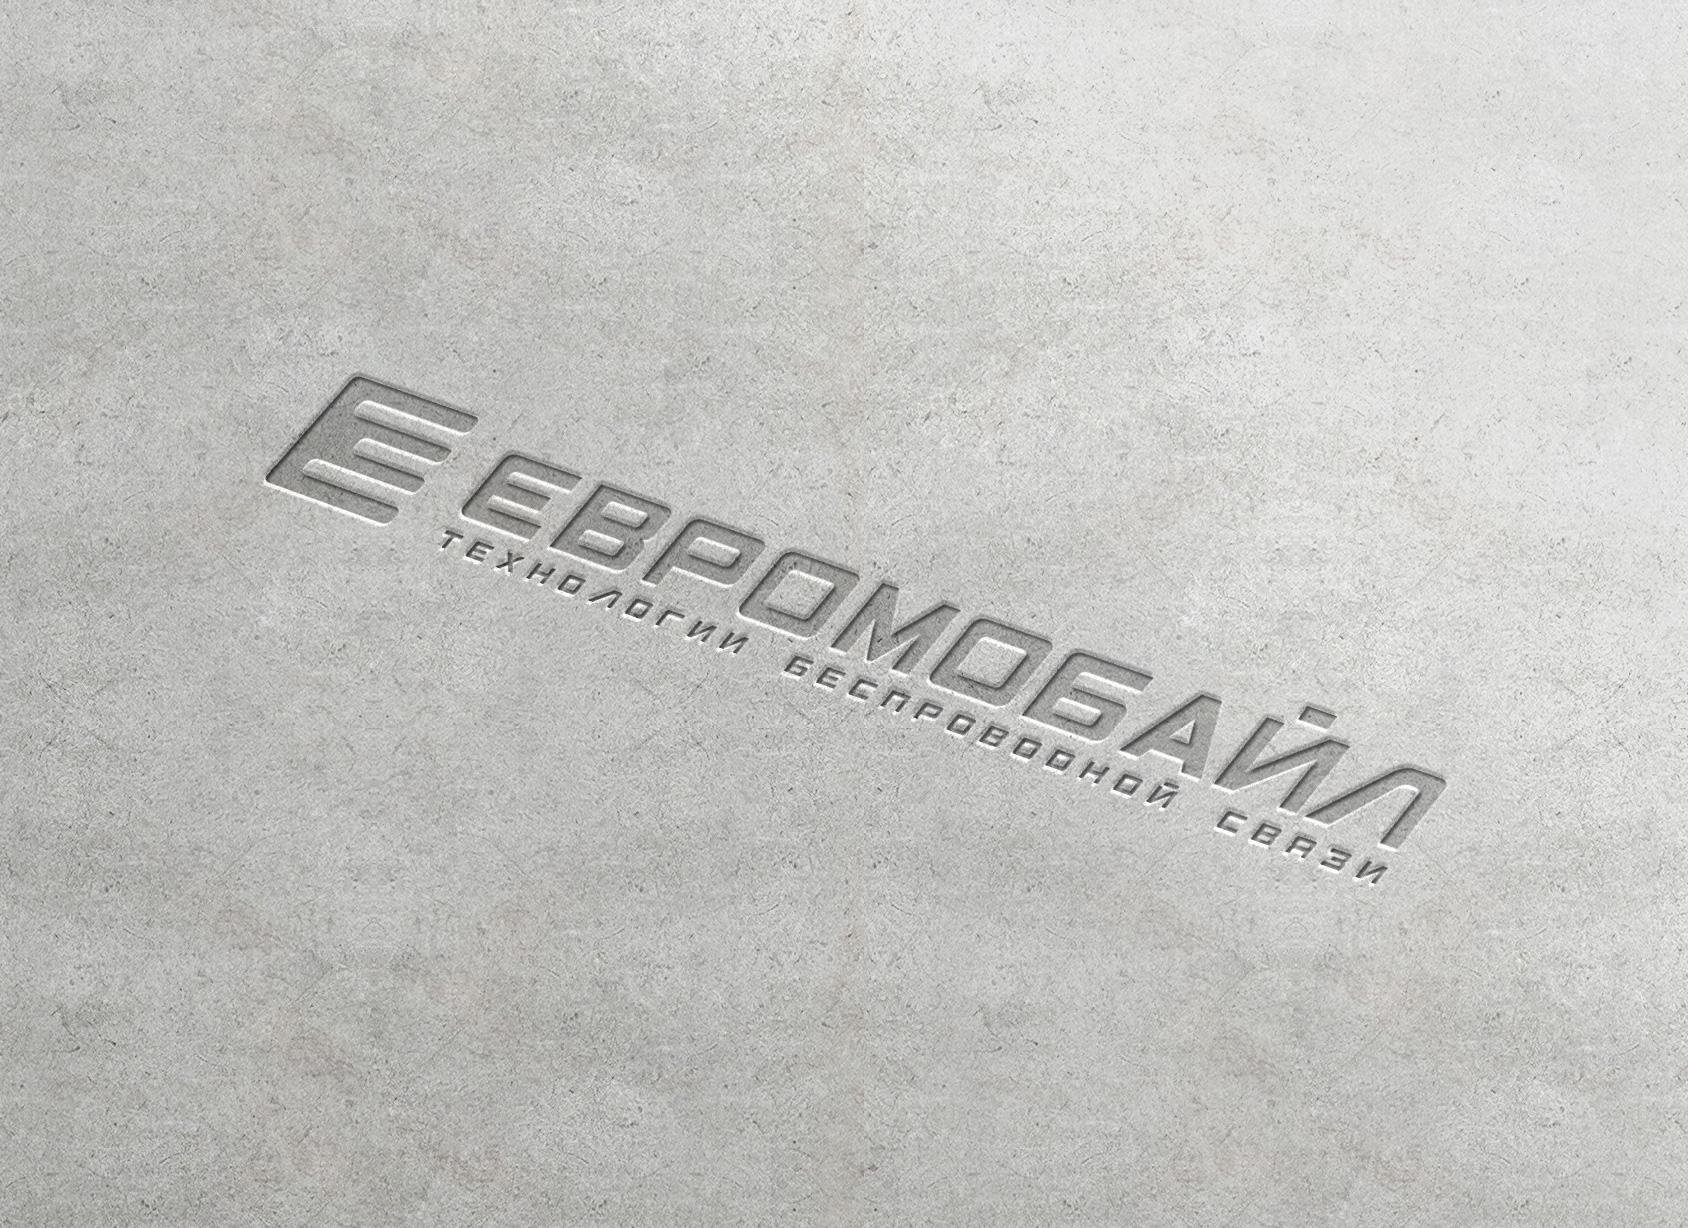 Редизайн логотипа фото f_65759c4dc8945536.jpg